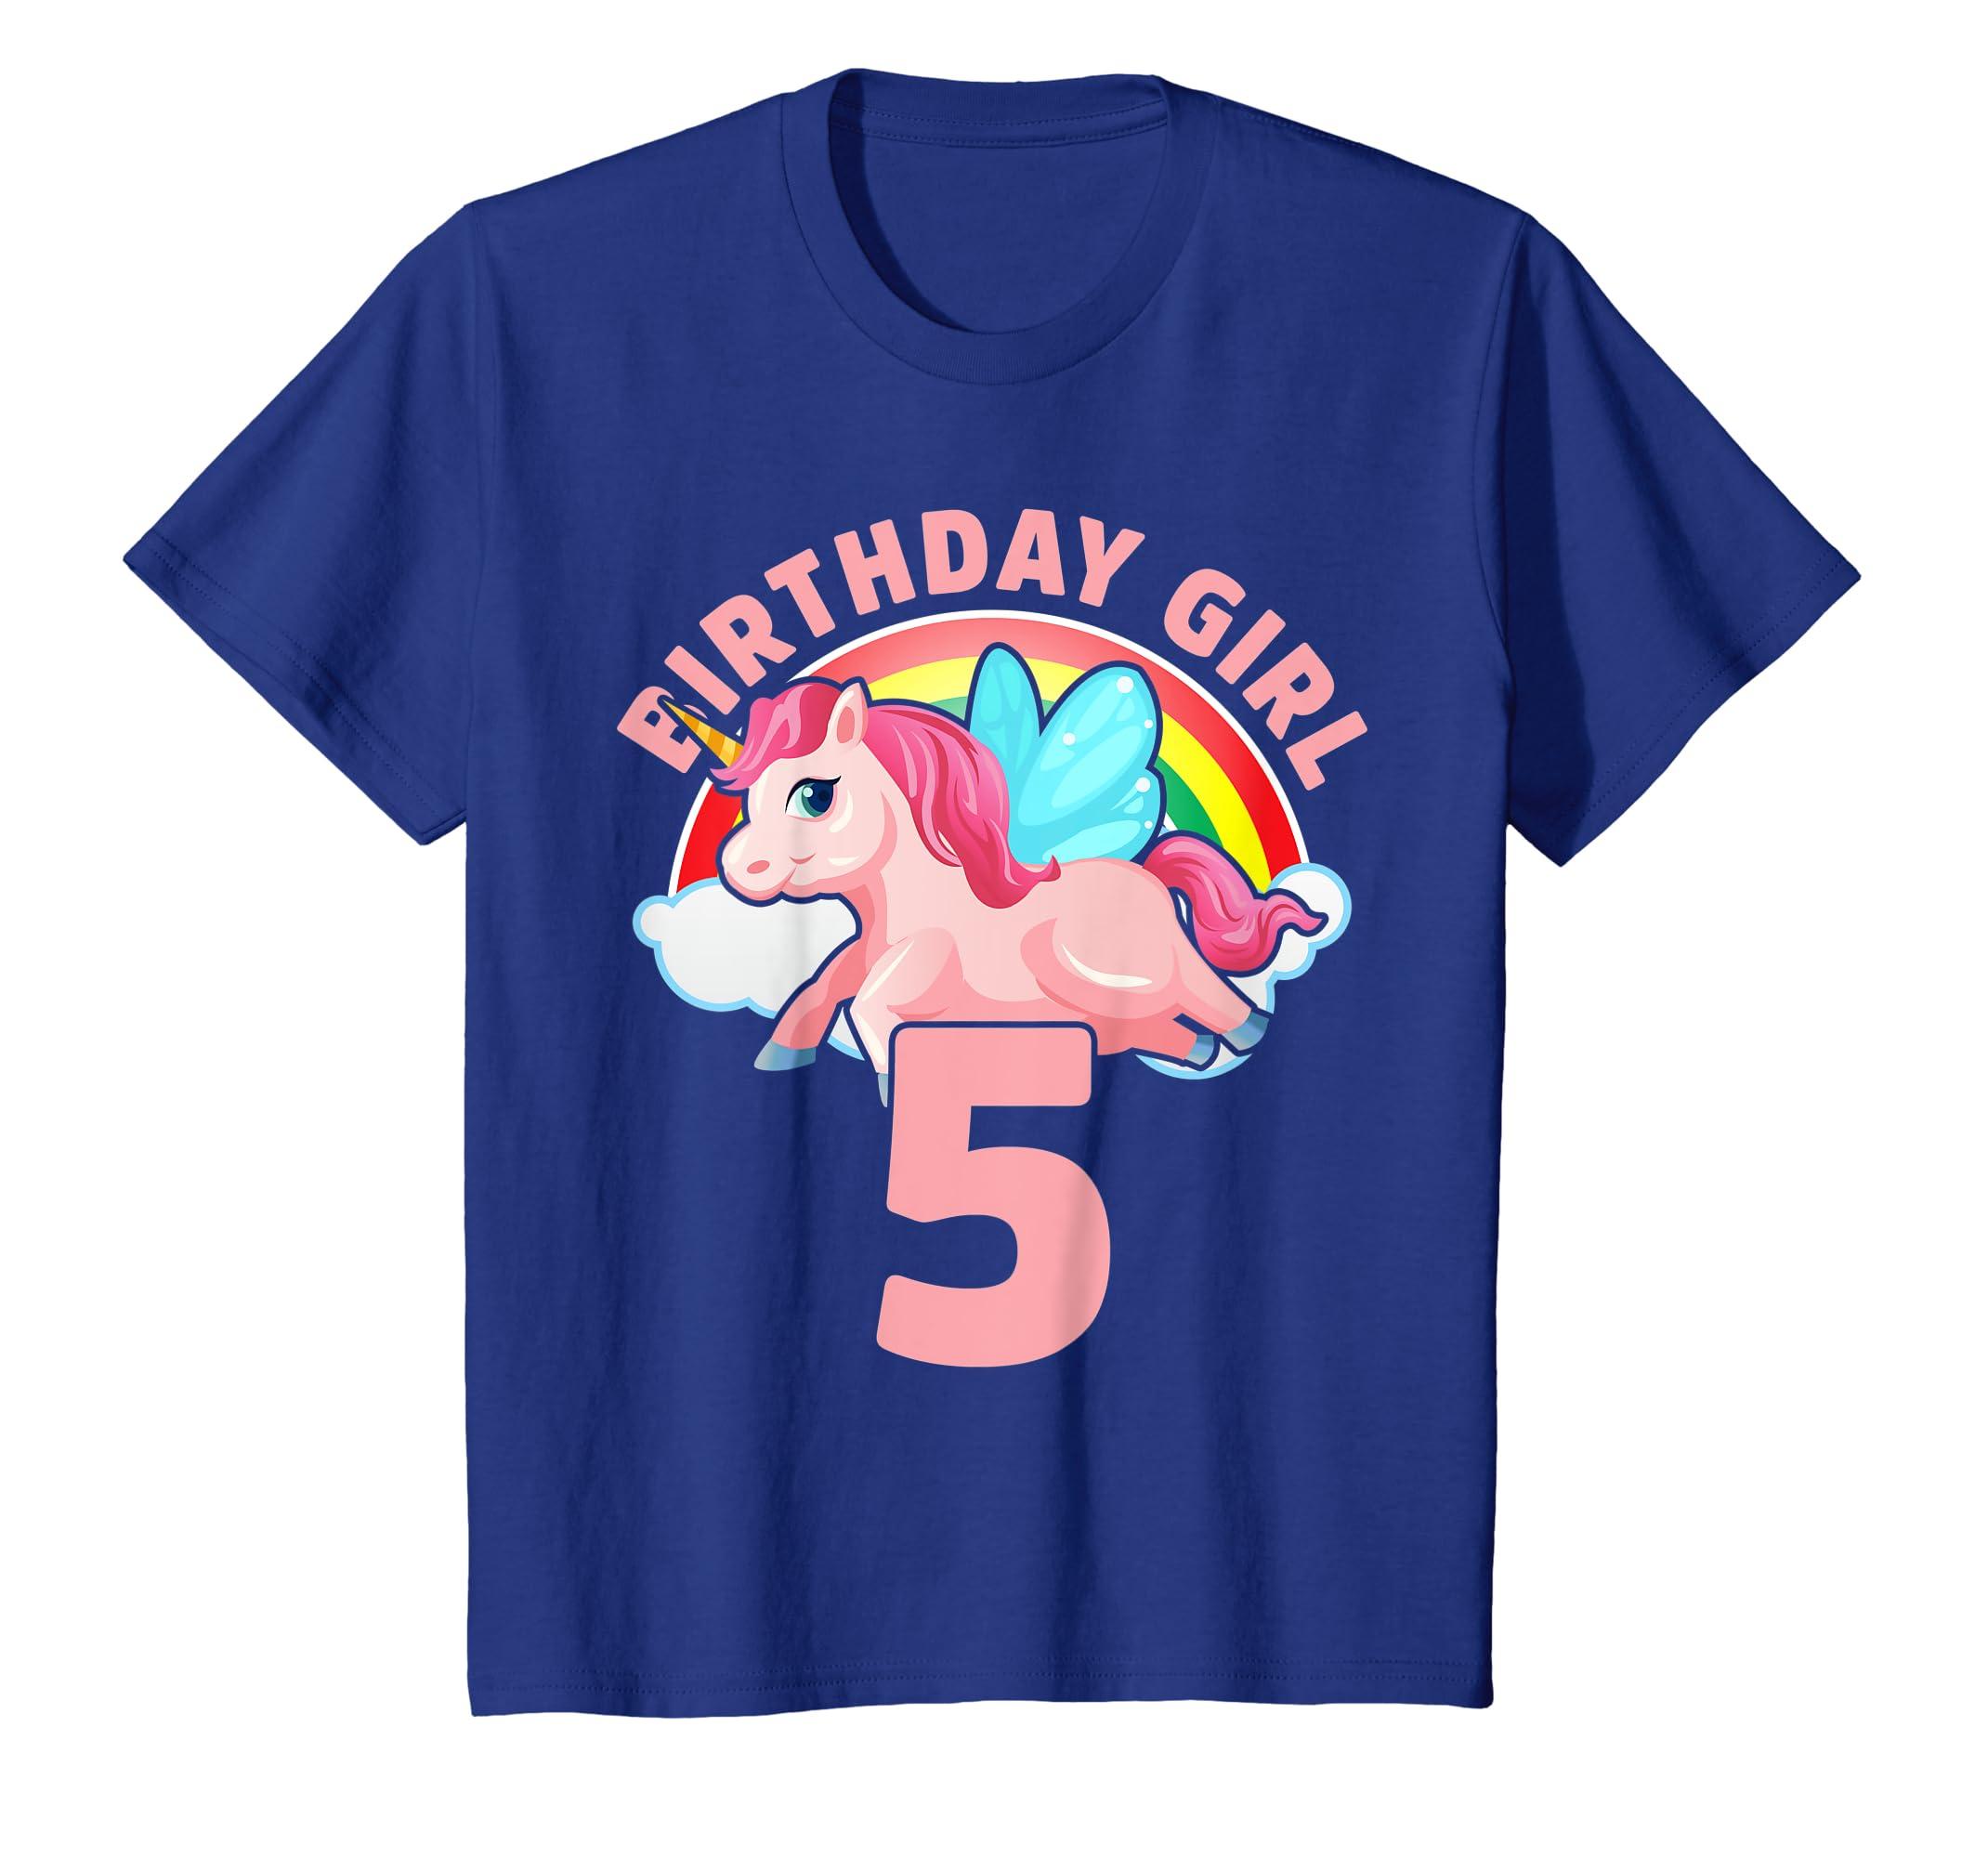 Amazon Kids 5 Year Old Birthday Outfit Girl Unicorn Gift